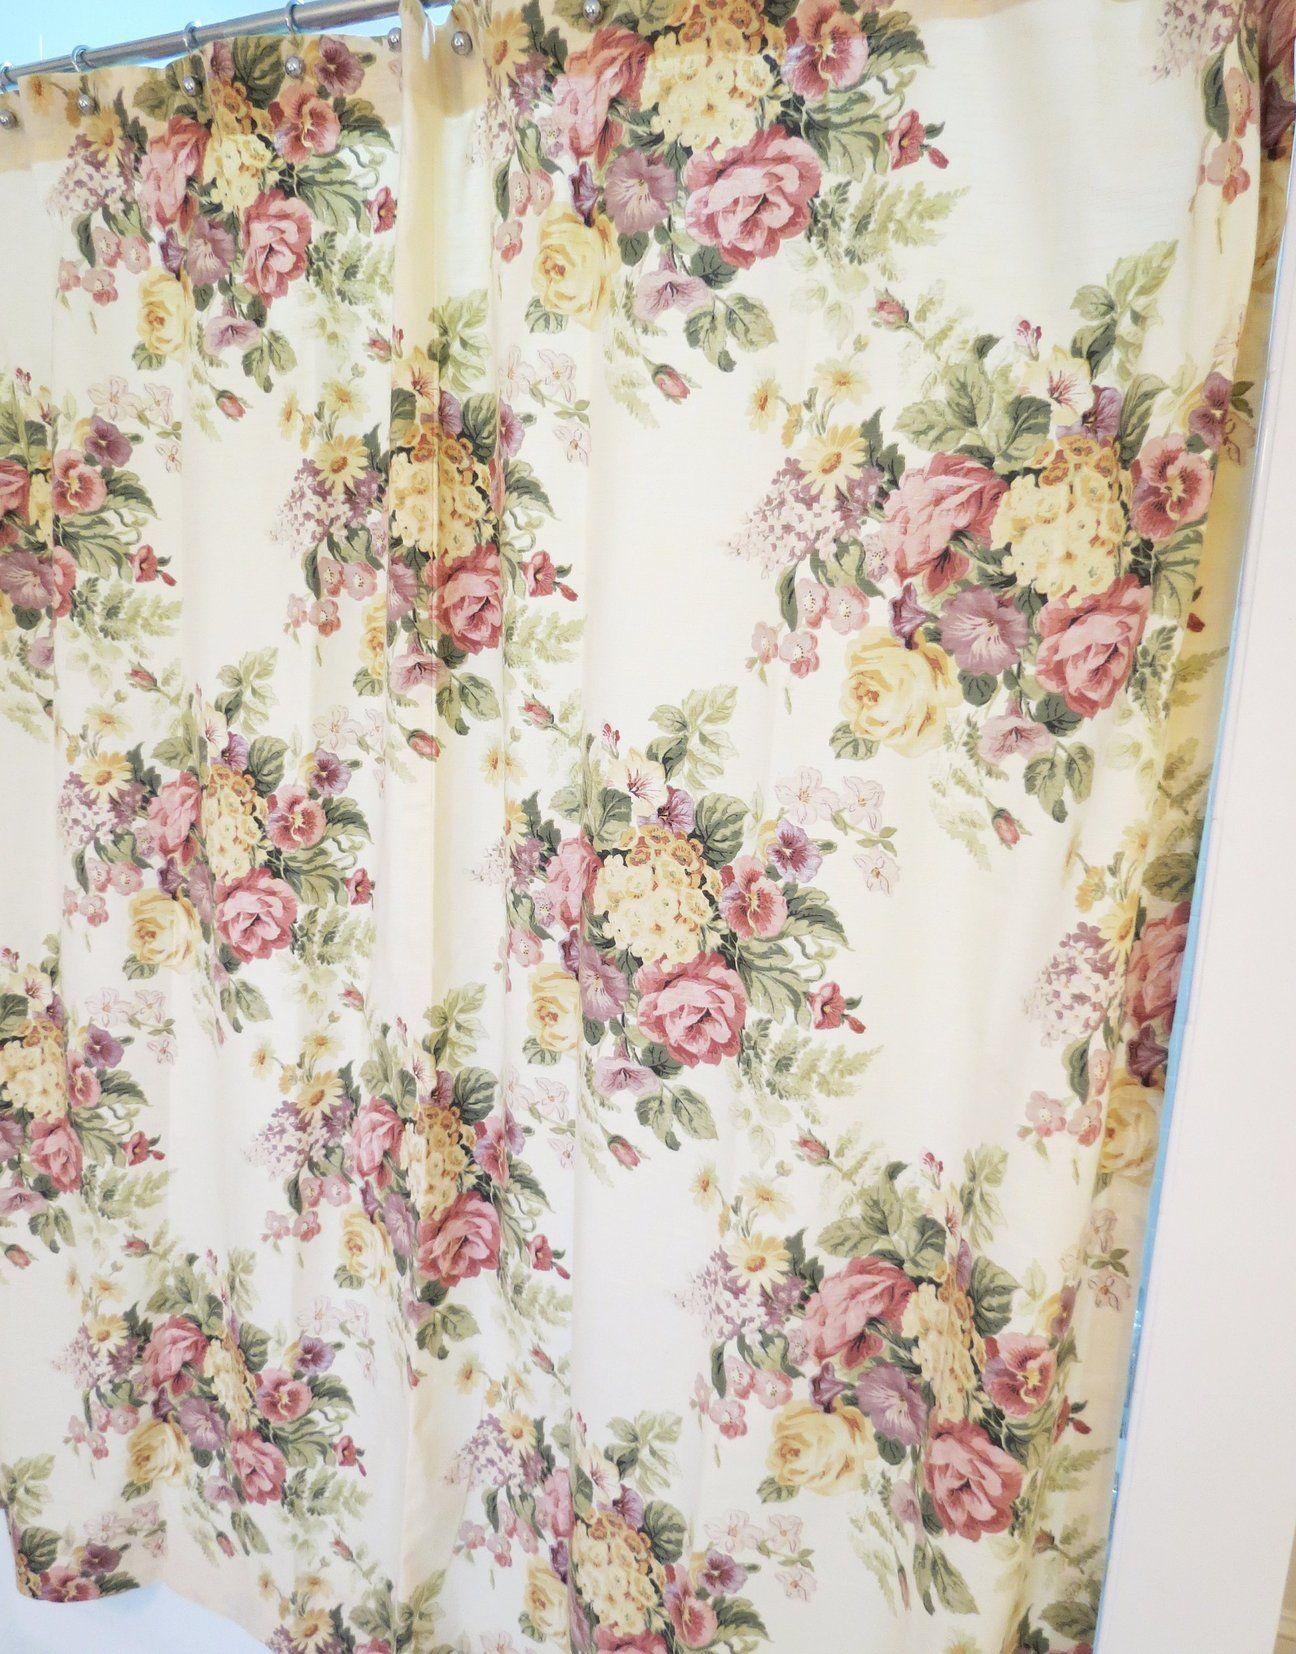 Vintage Shower Curtain Shabby Chic